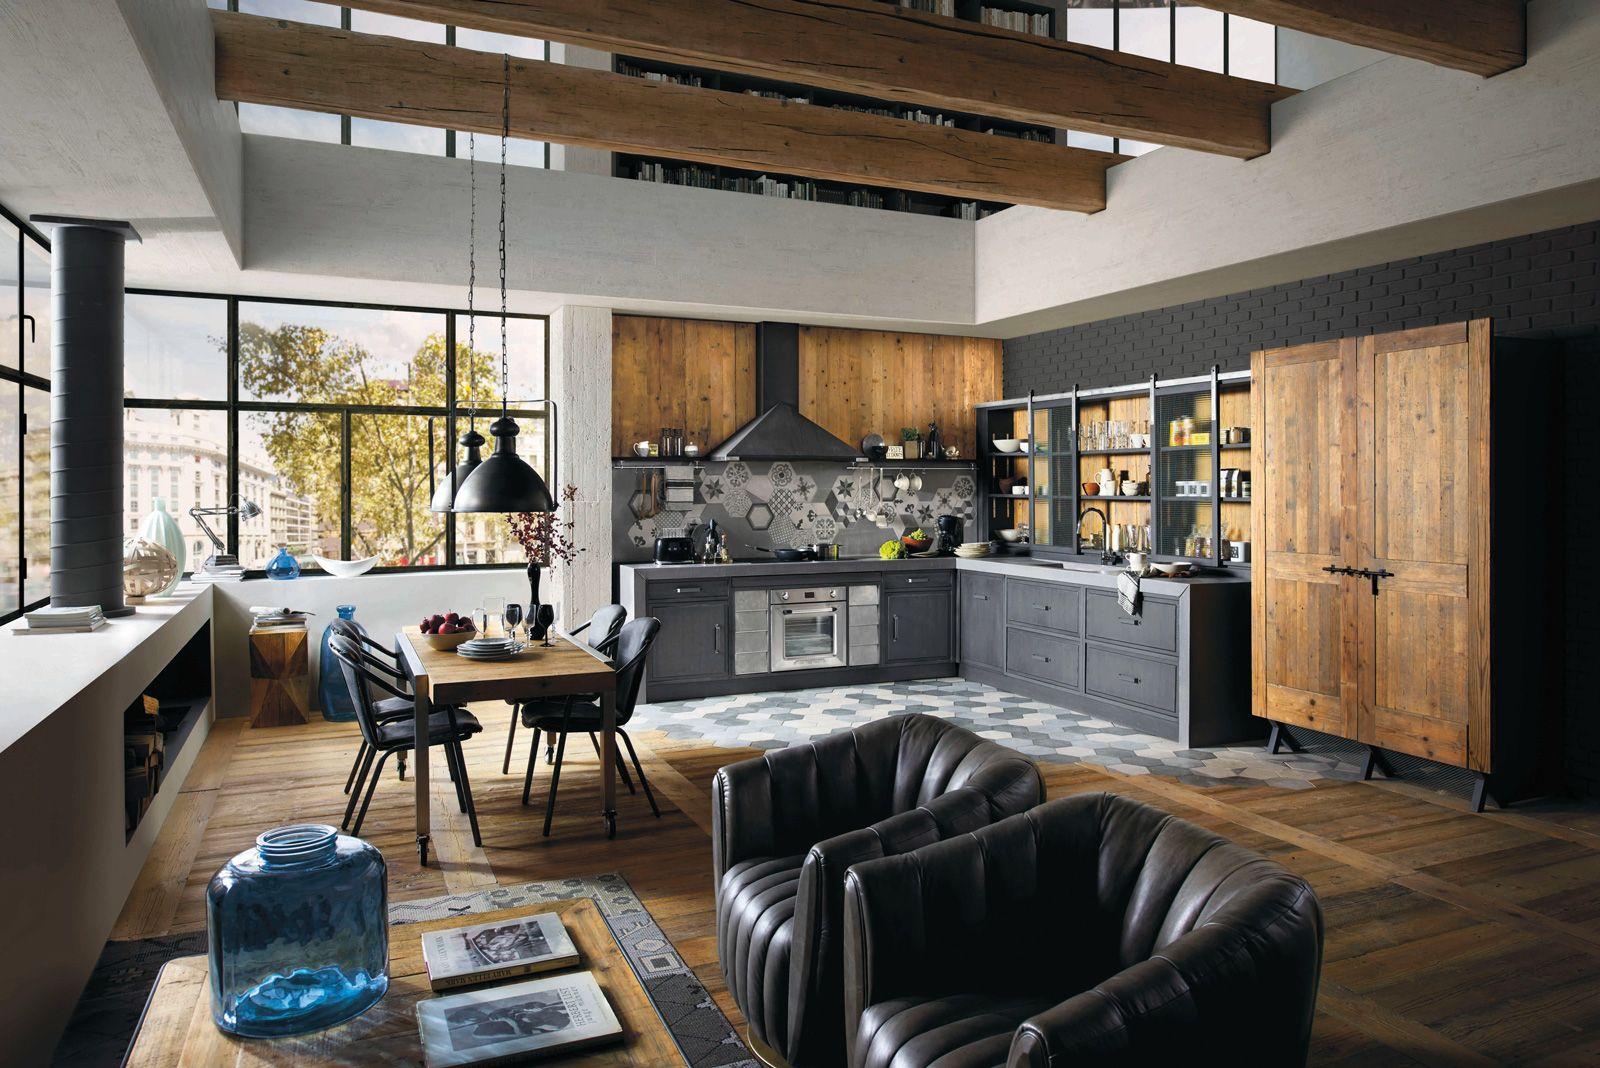 Cucina in stile industriale - Cucina in legno e metallo ...